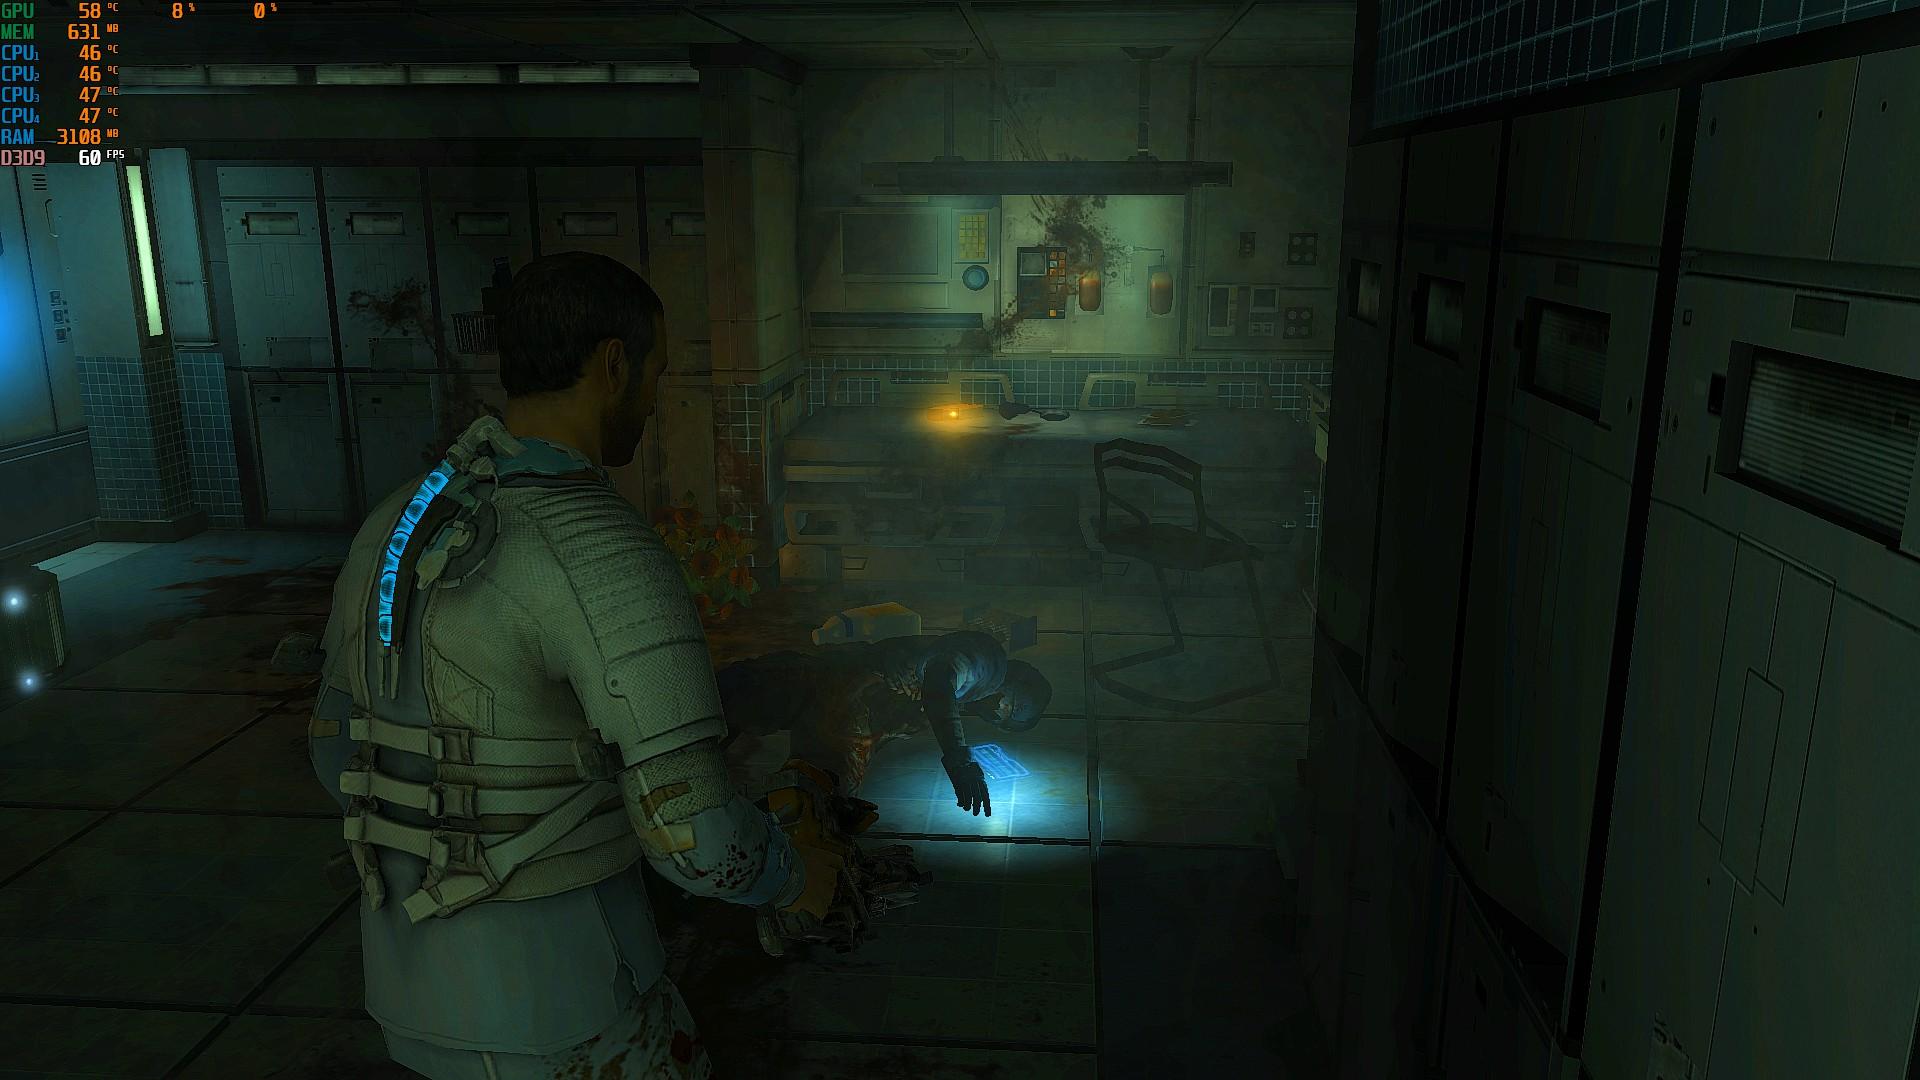 00037.Jpg - Dead Space 2